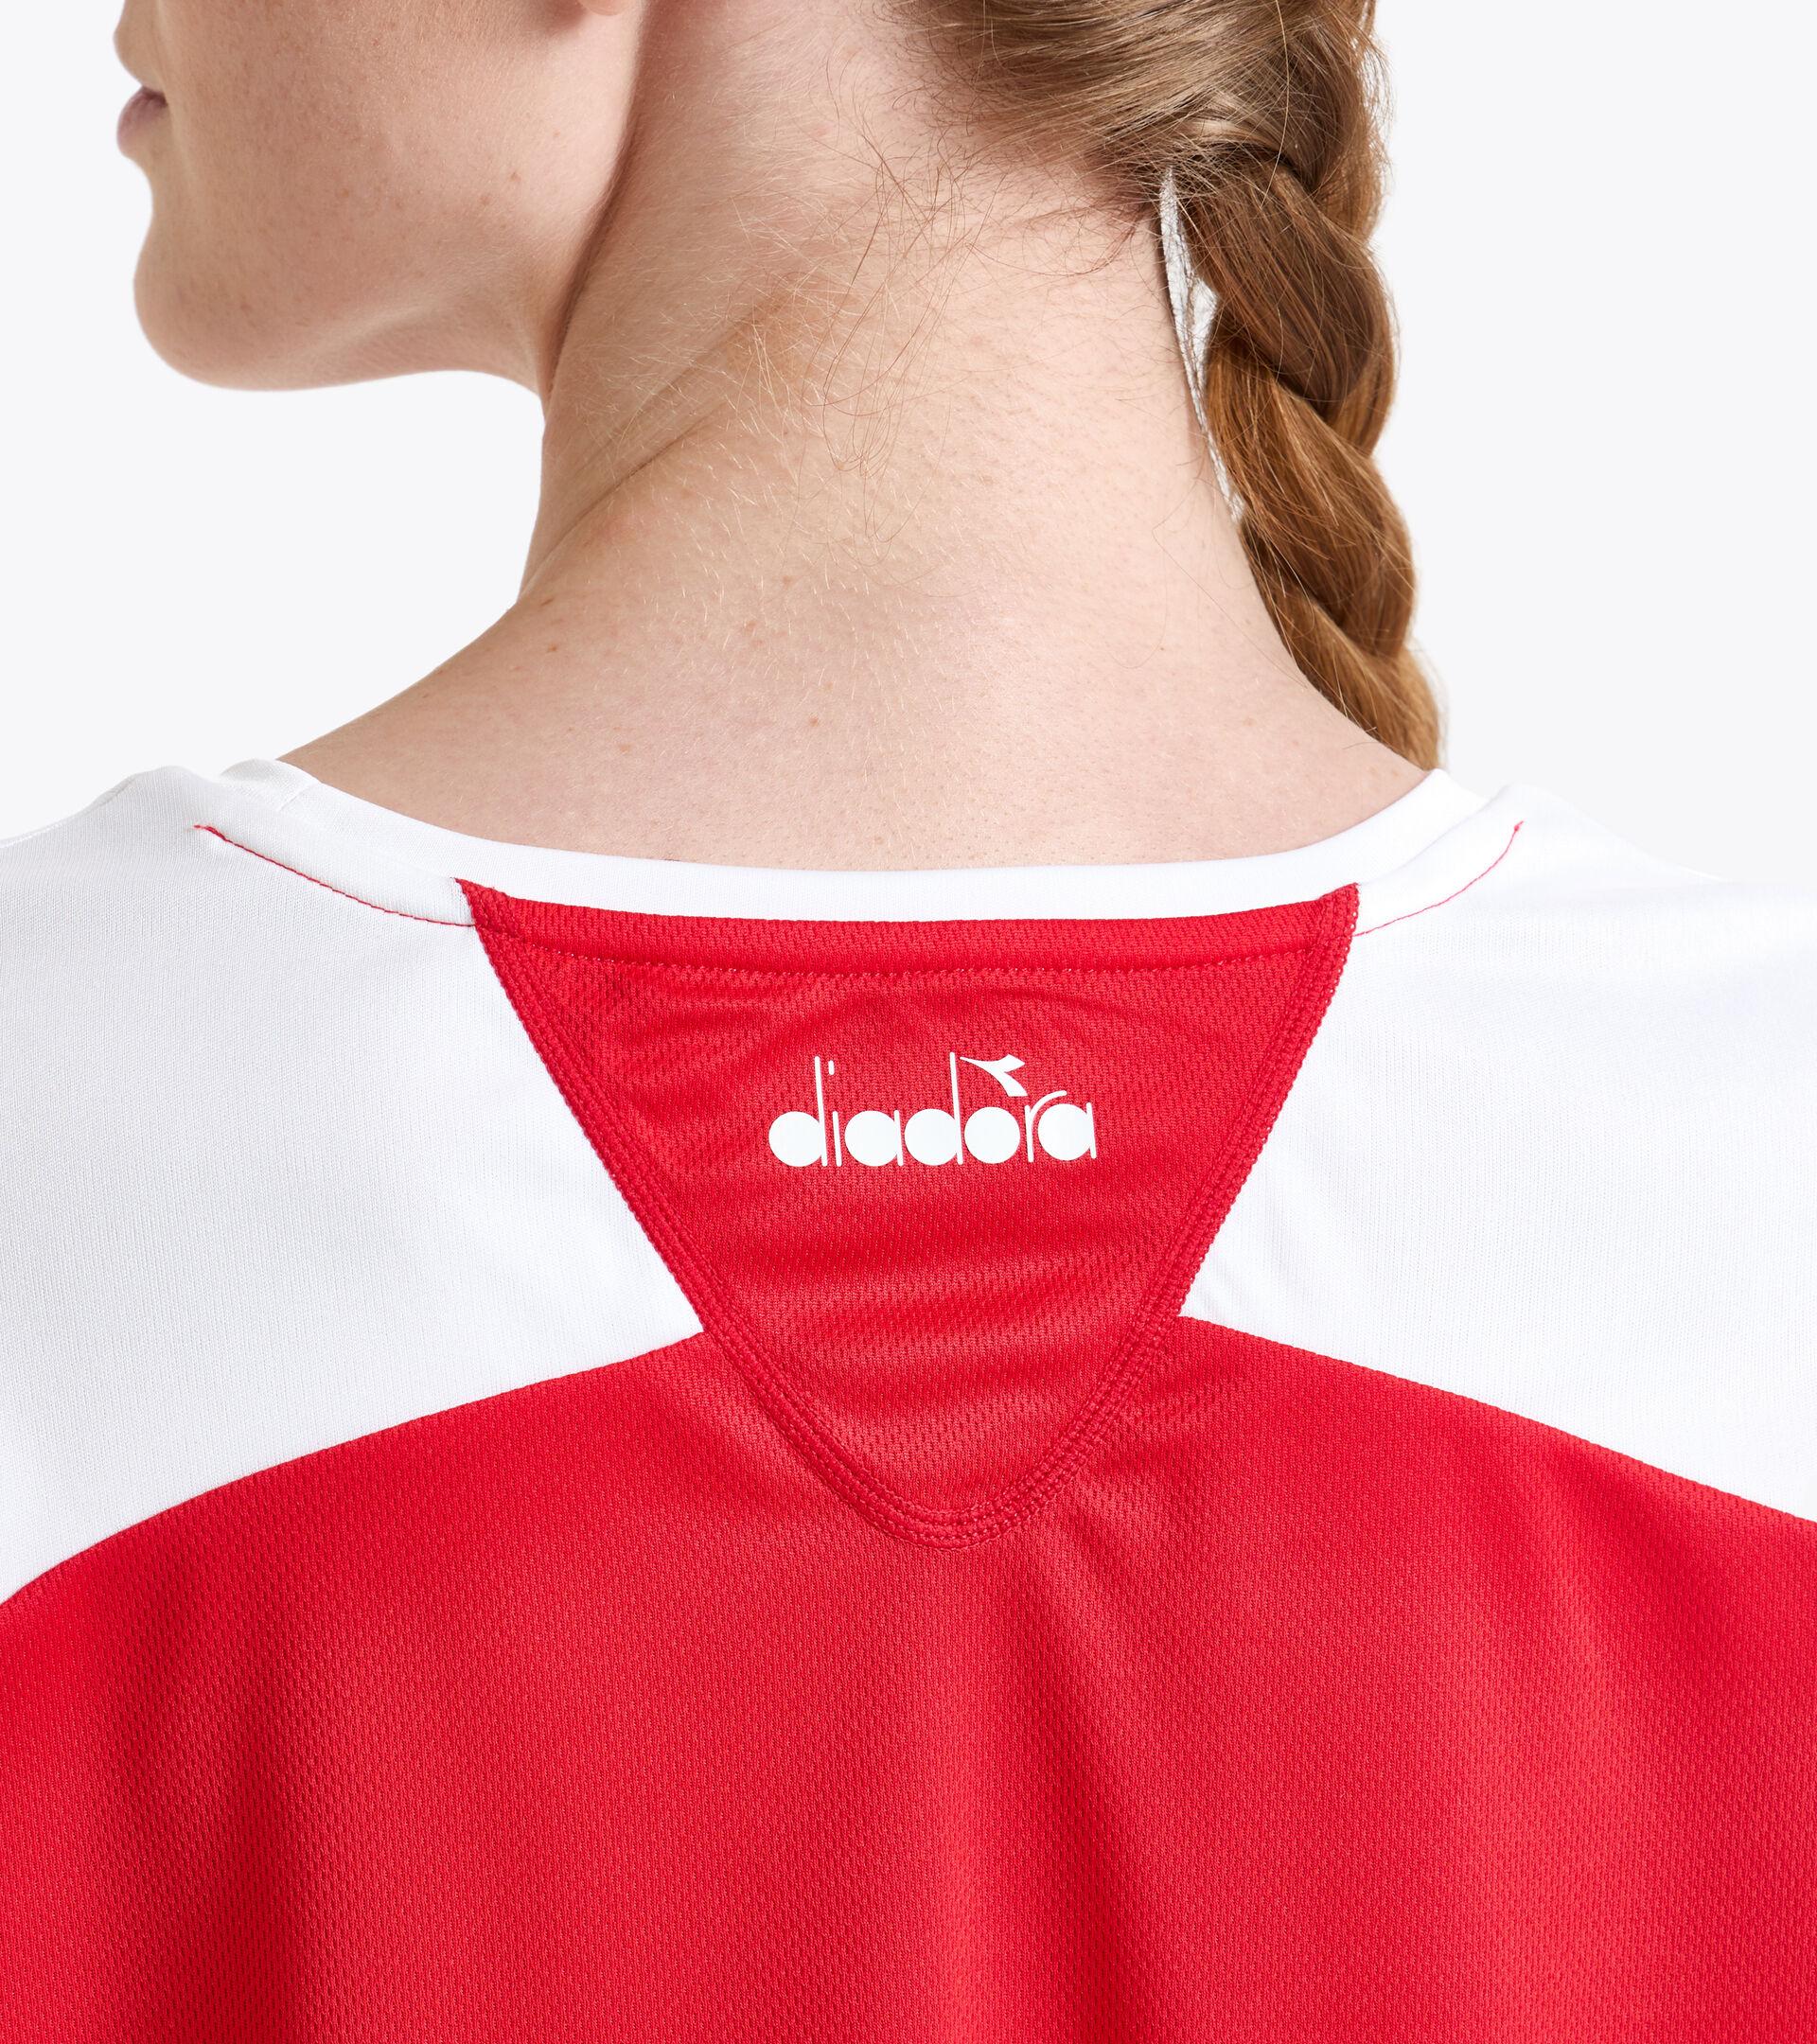 Camiseta de tenis - Mujer L. T-SHIRT COURT ROJO TOMATE - Diadora